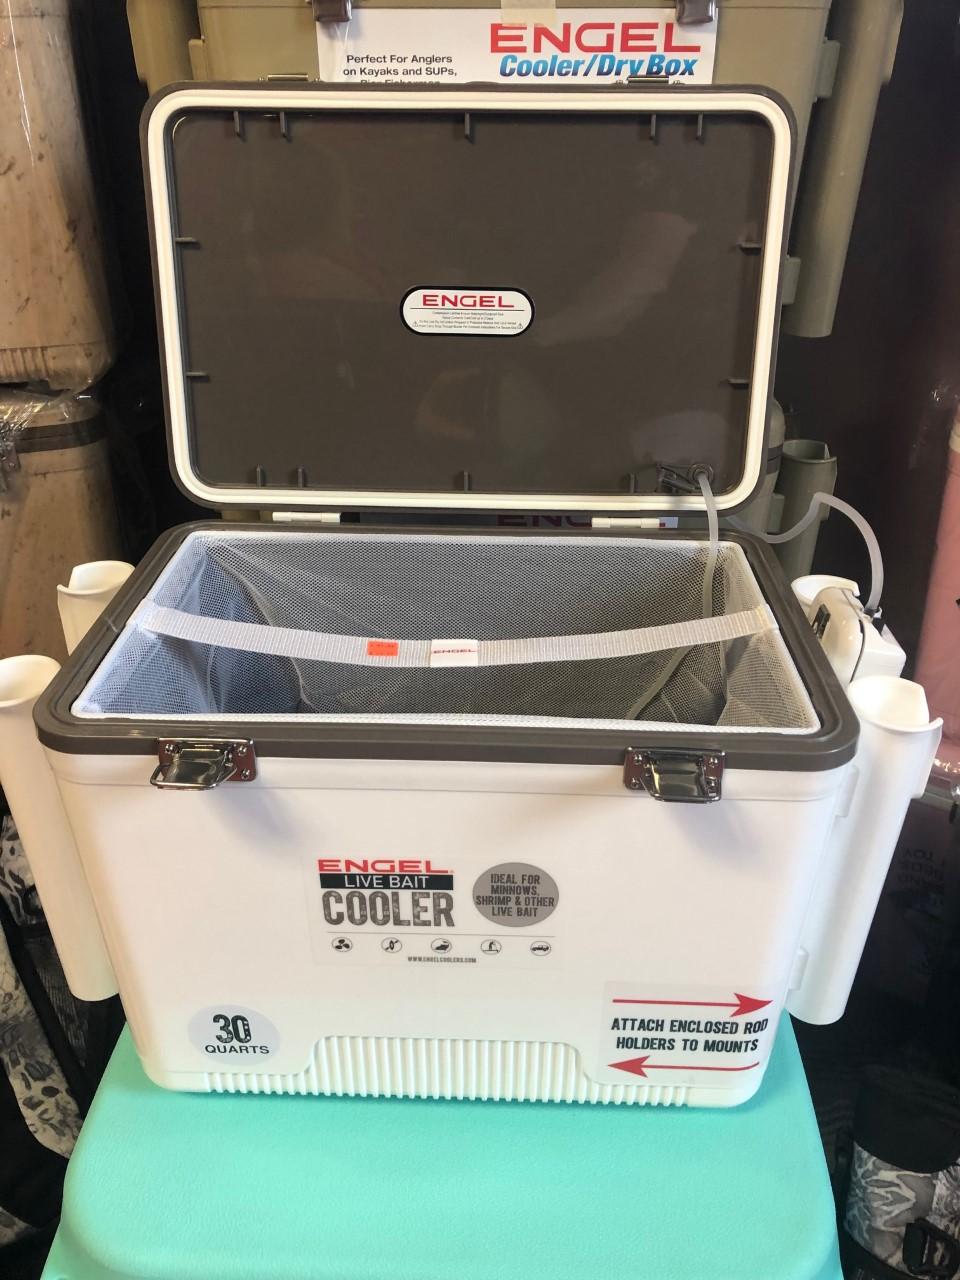 ENGEL COOLER/DRY BOX LIVE BAIT COOLERS